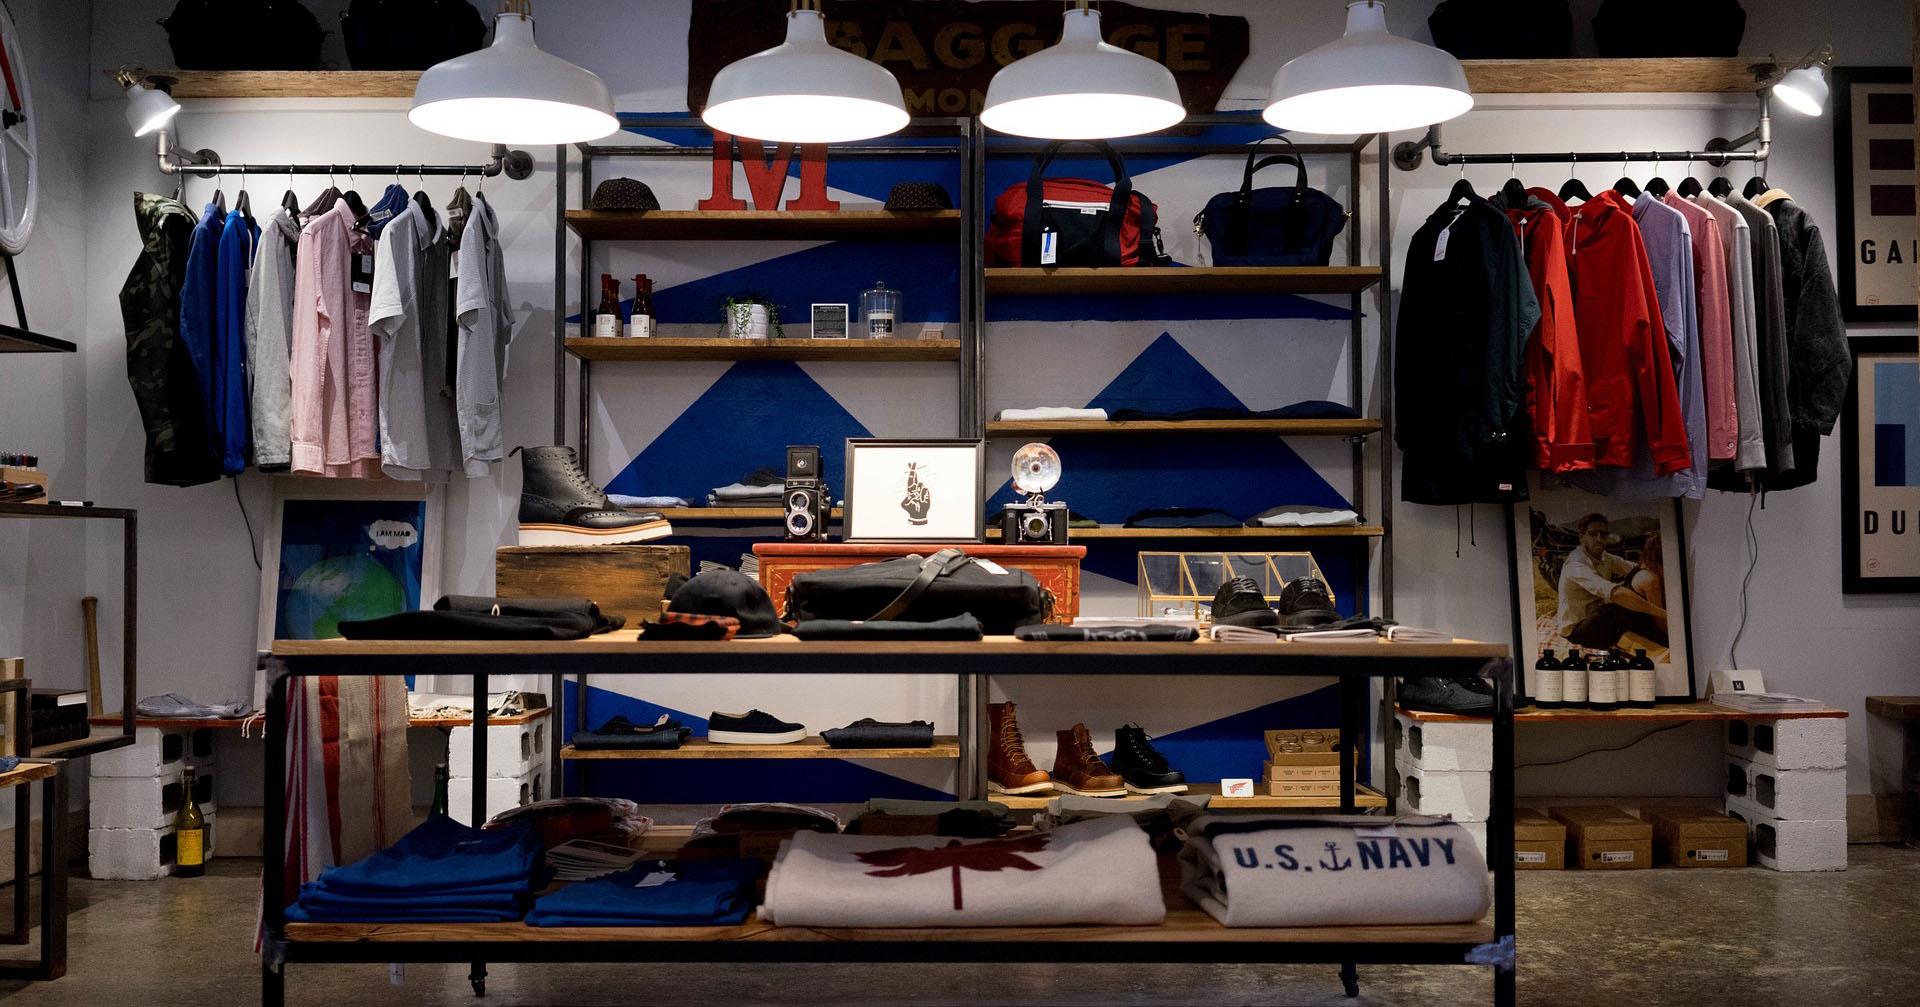 store clothing racks shoes